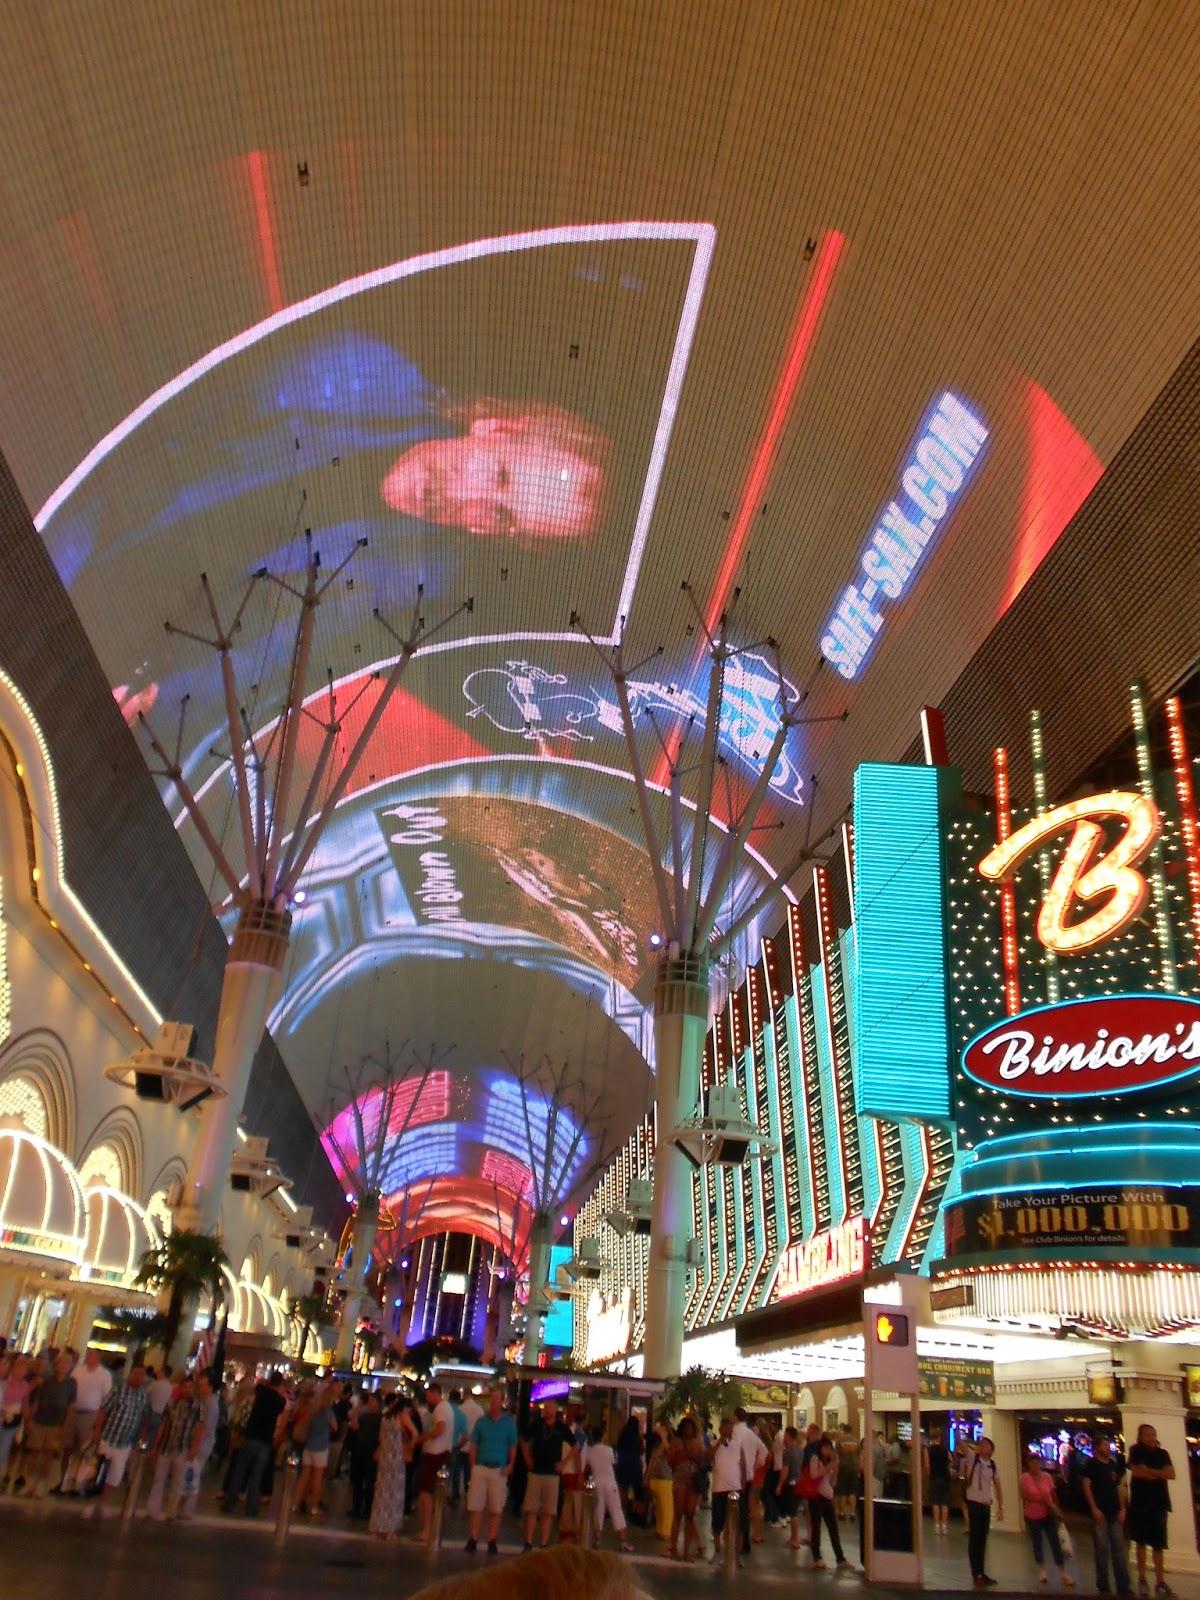 Downtown Las Vegas Freemont Street & Hallu0027s America Experience: Downtown Las Vegas Freemont Street